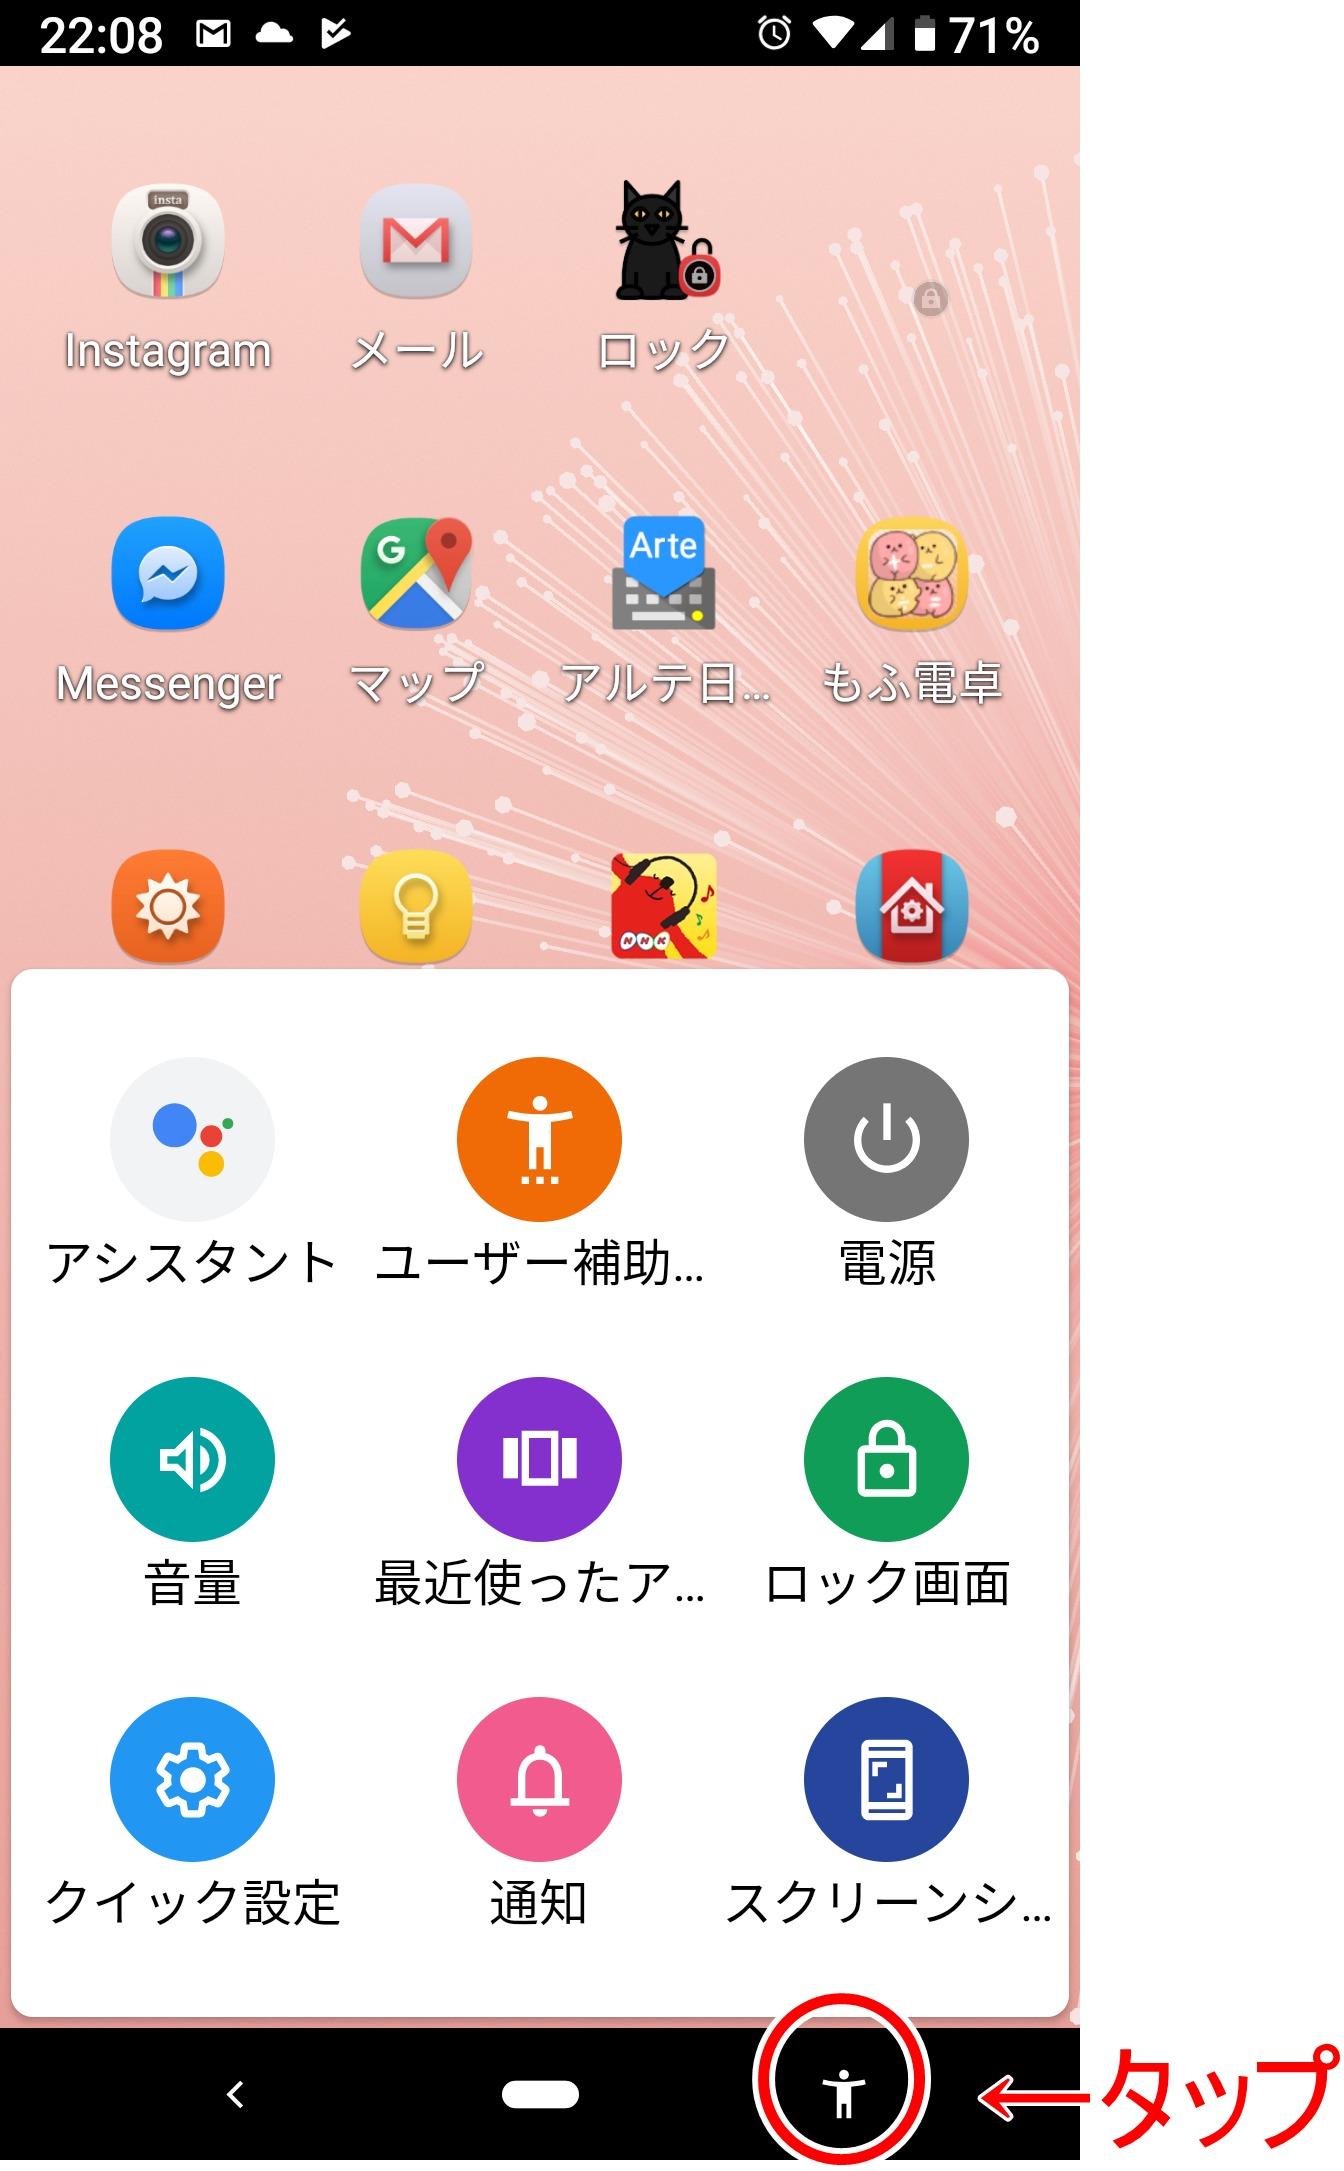 693a75e6d0 Pixel3 Android9 便利な「ユーザー補助機能メニュー」 | eikokageさんの掲示板 | マイネ王